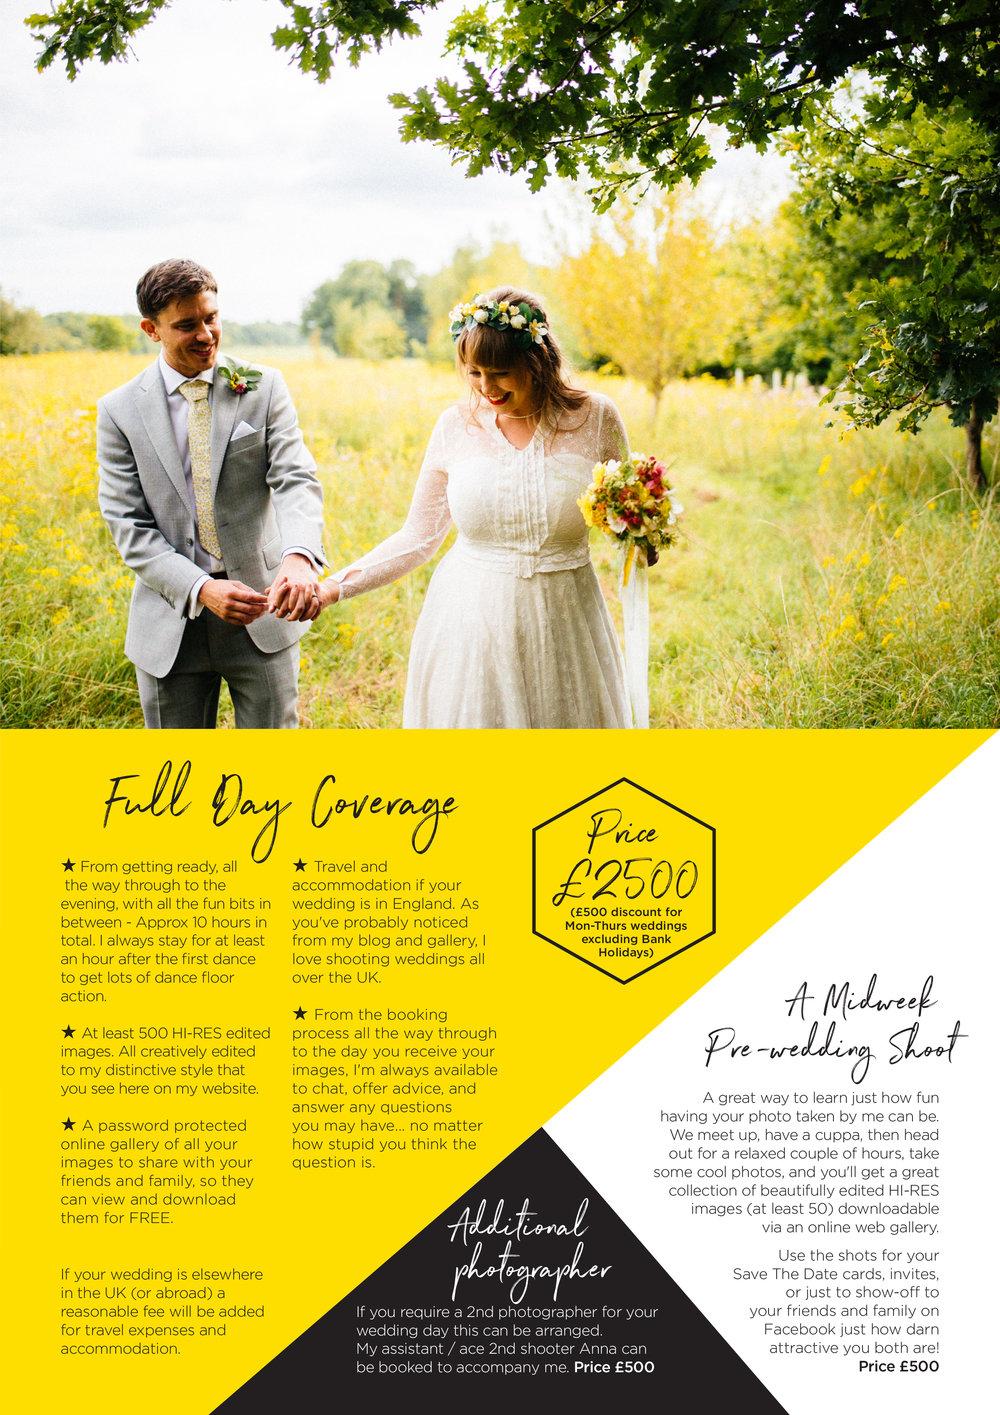 wedding photography prices.jpg